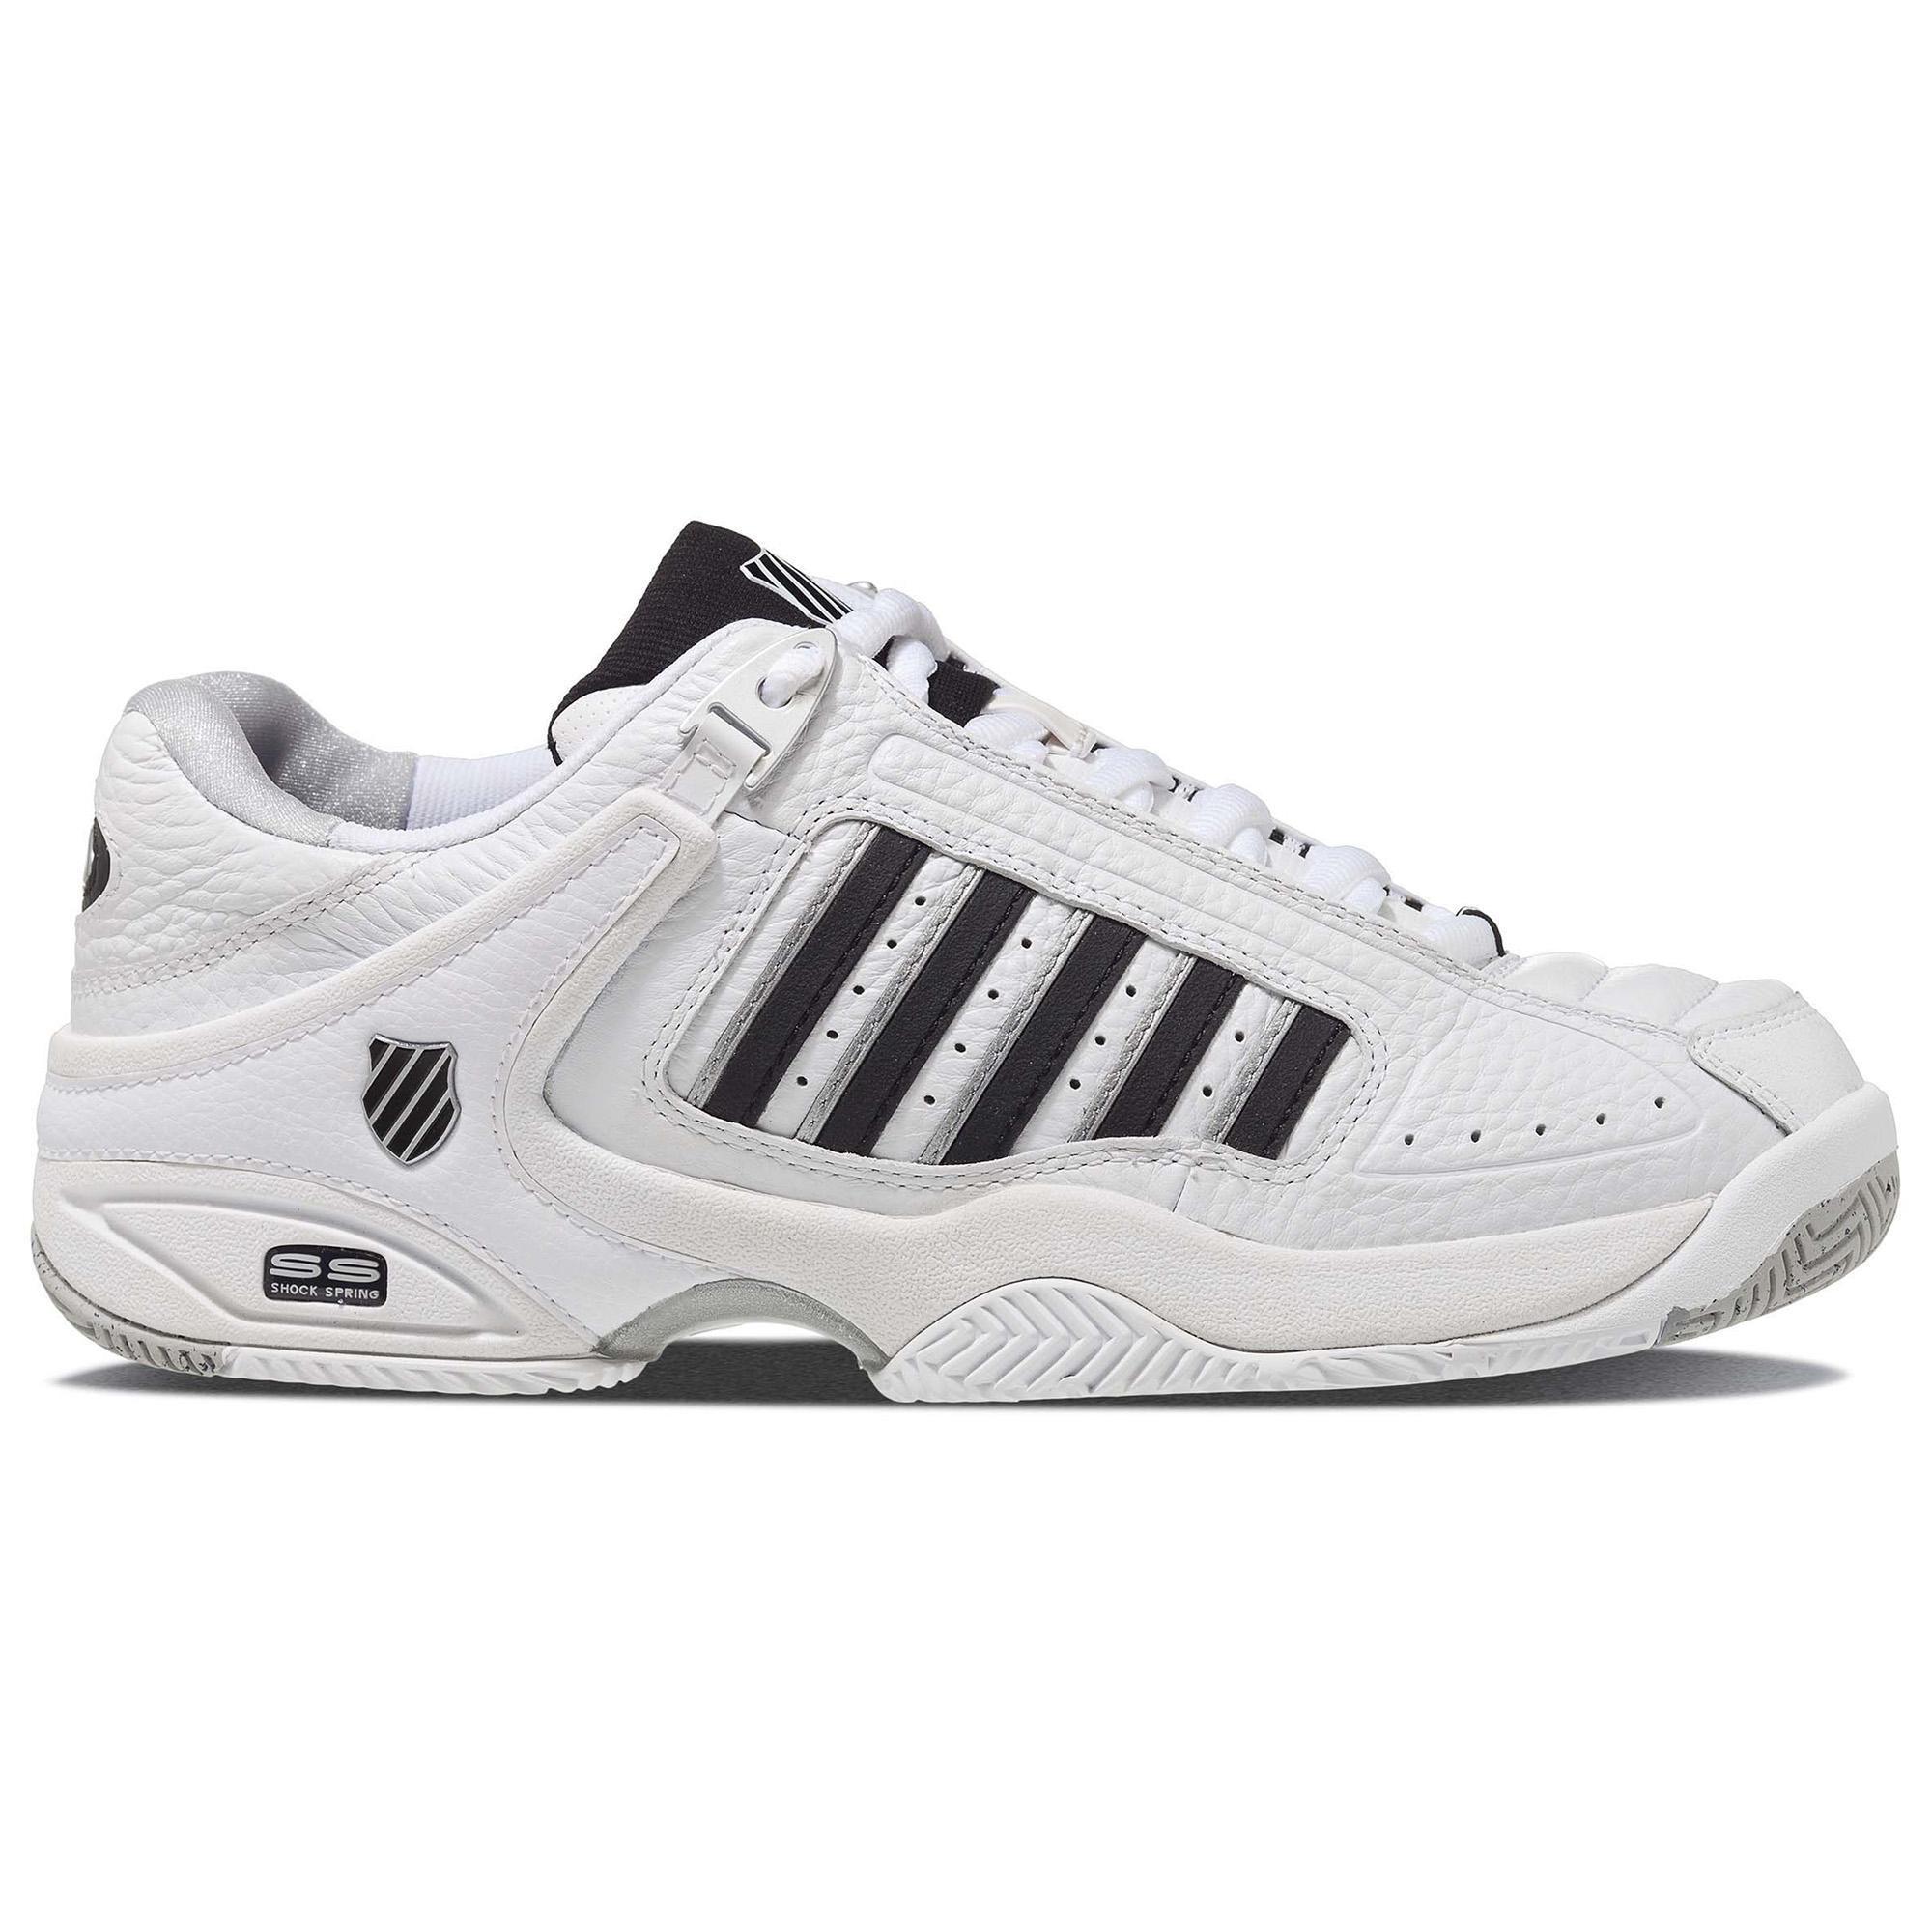 K-Swiss Mens Defier RS Tennis Shoes - White Black - Tennisnuts.com bb92d3b80011